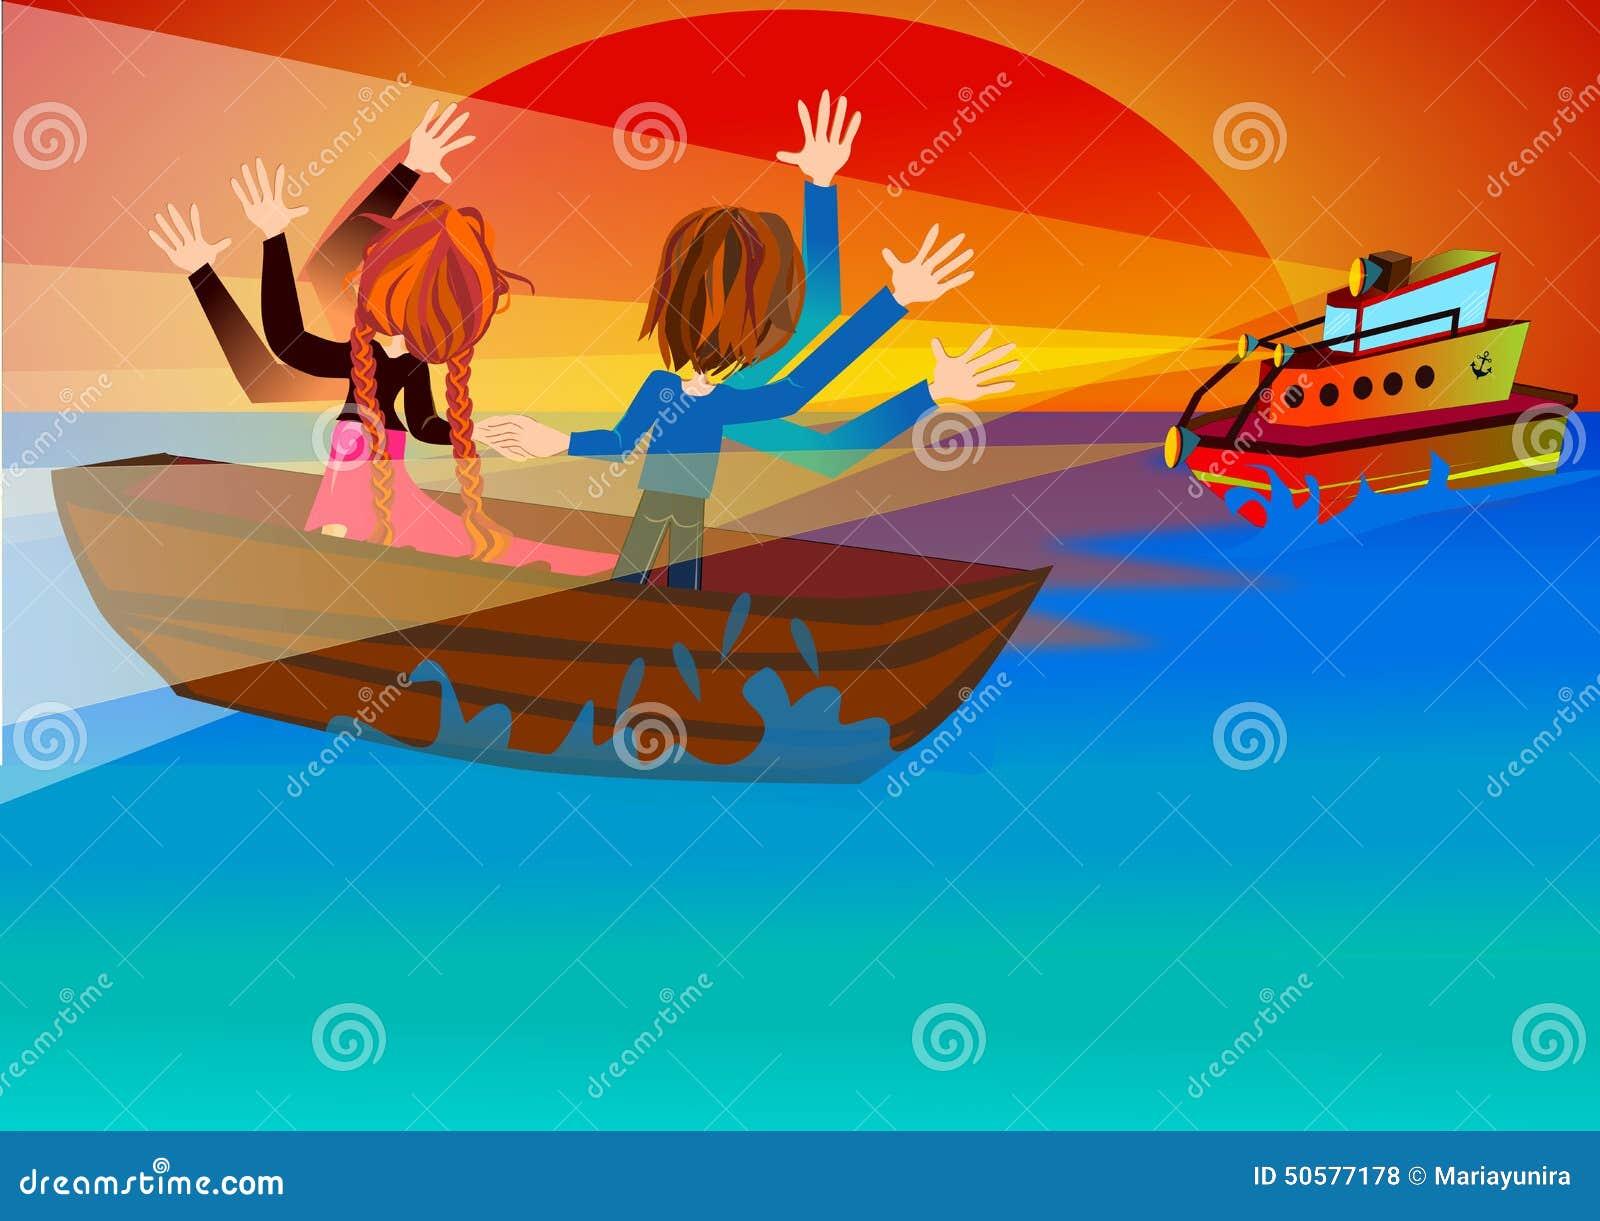 De Reddingsboot komt